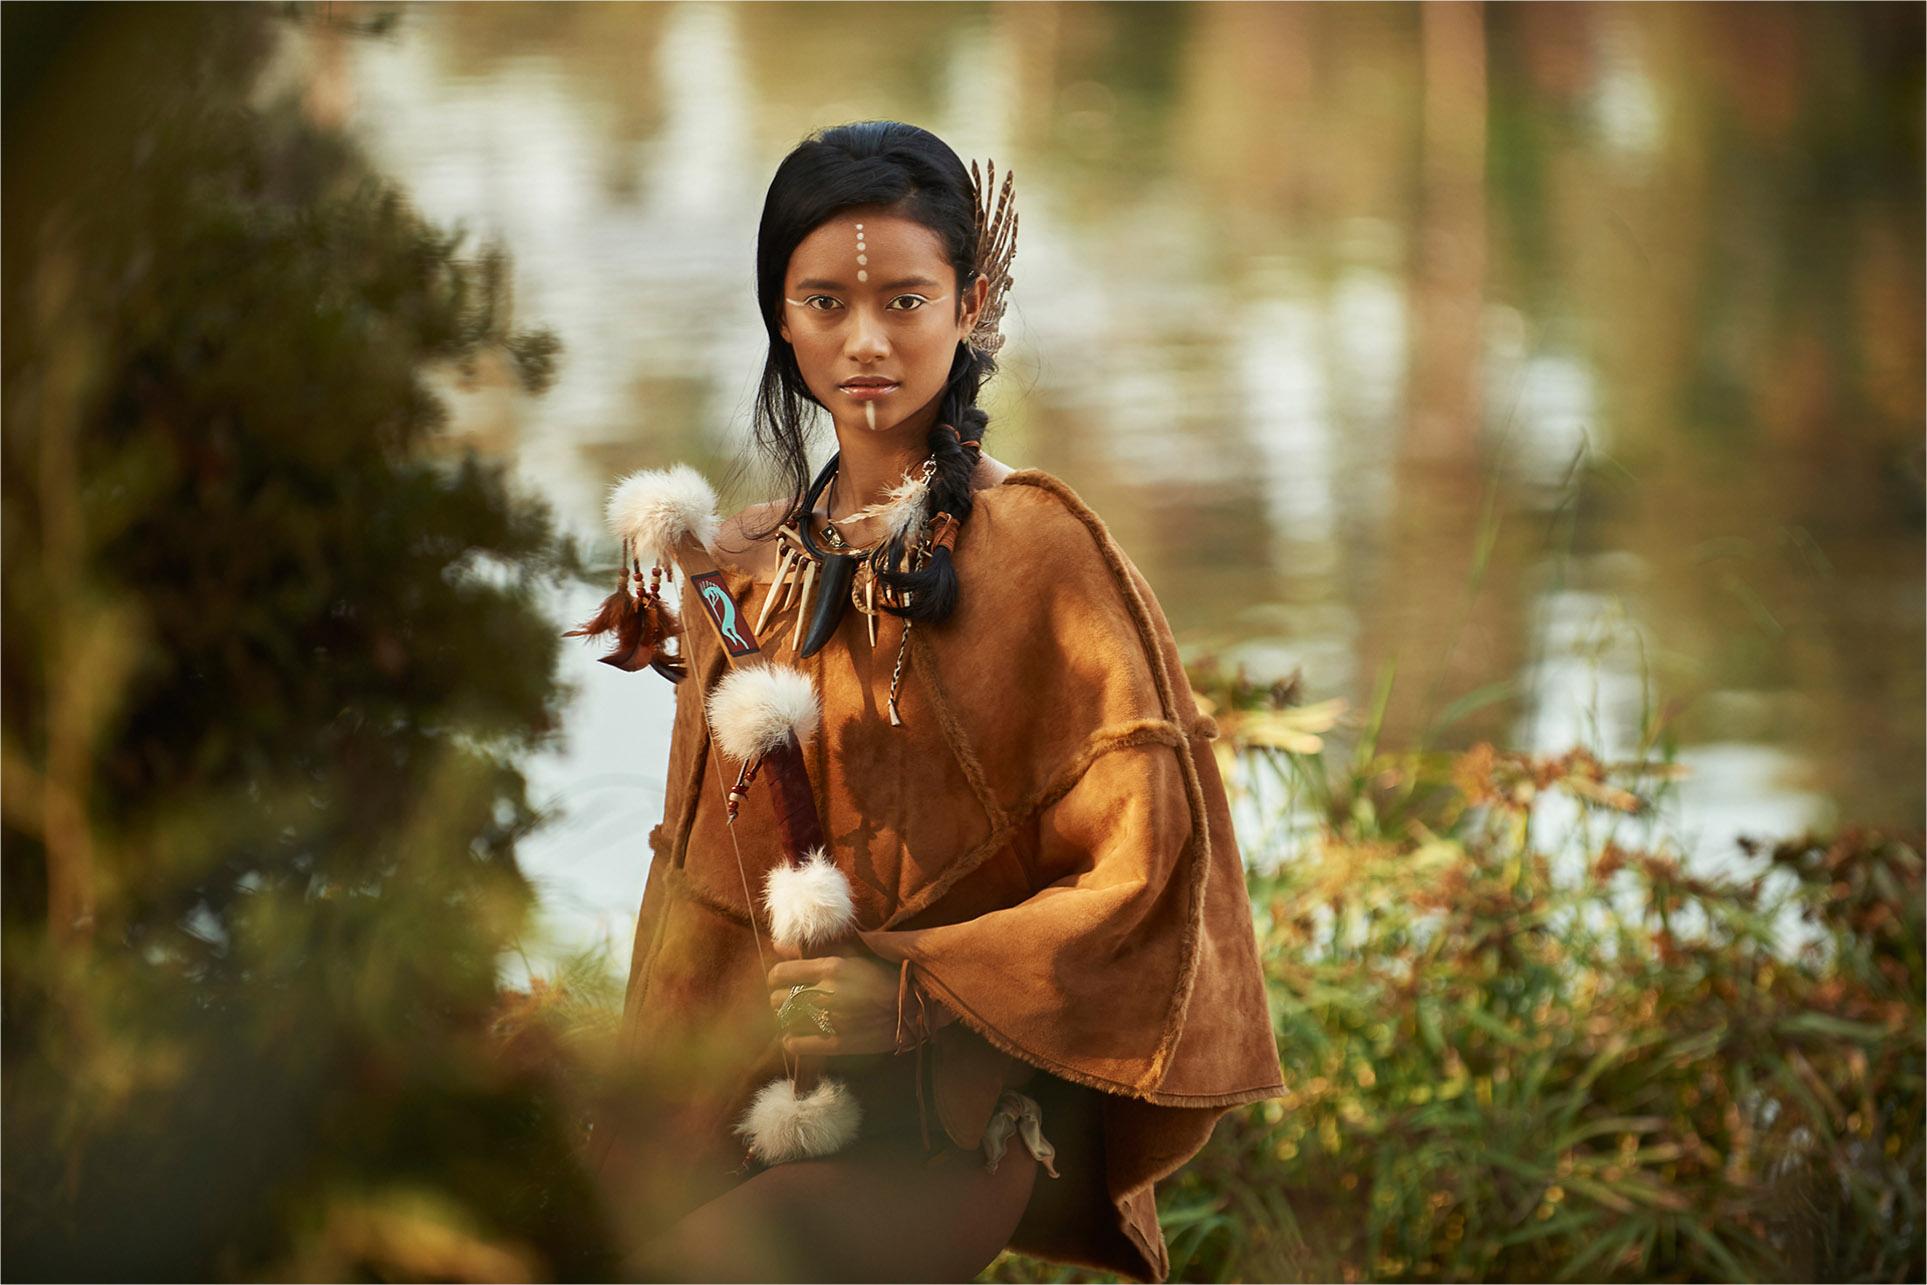 Tribal Warrior by Dmitry Bocharov